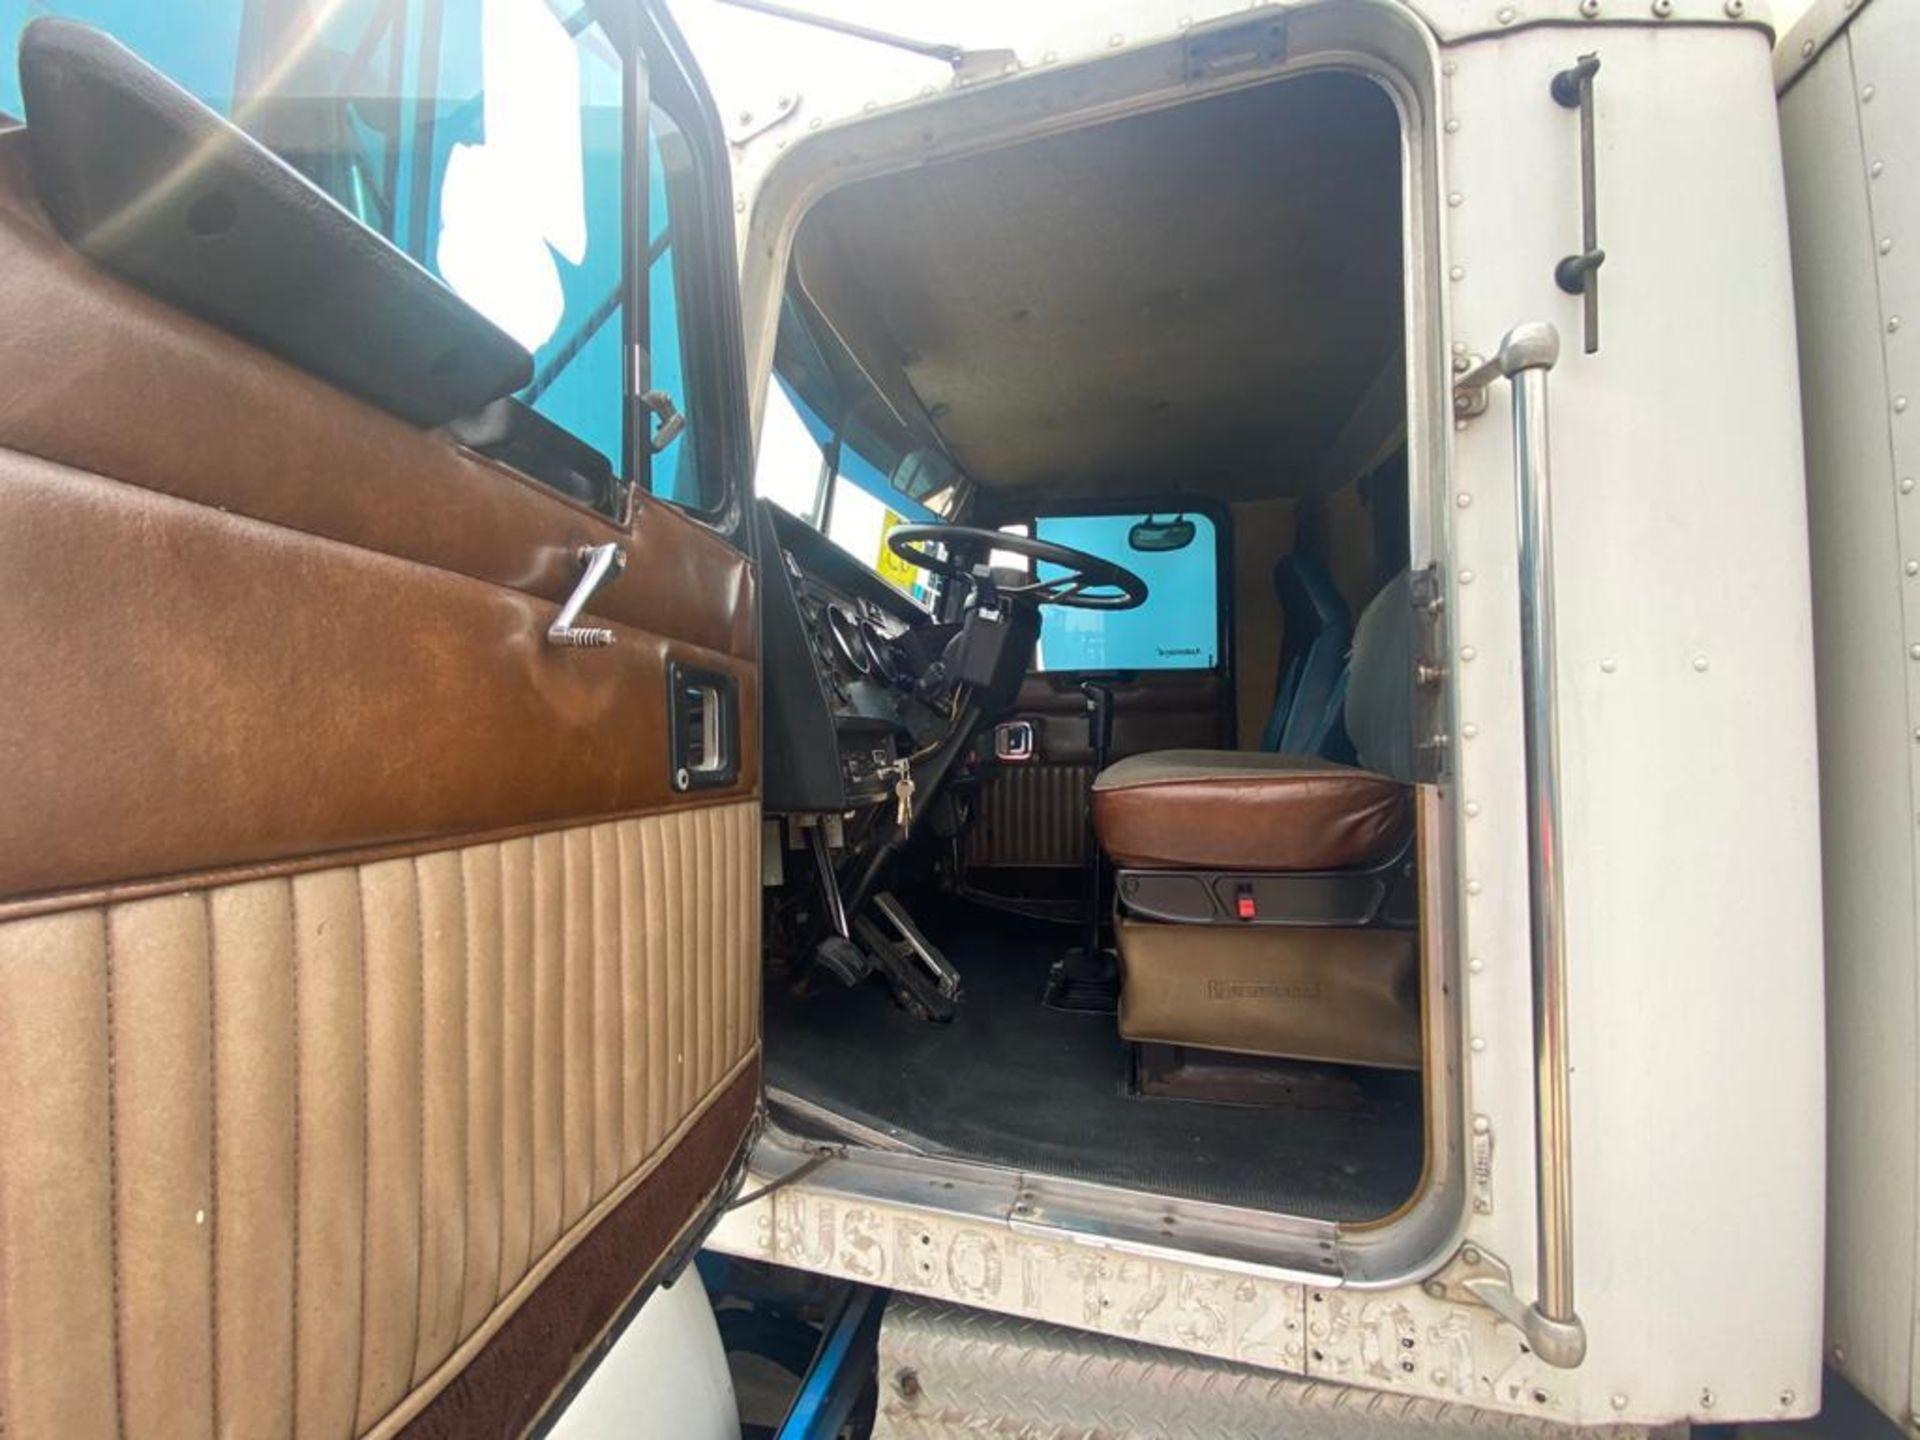 1999 Kenworth Sleeper truck tractor, standard transmission of 18 speeds - Image 46 of 62